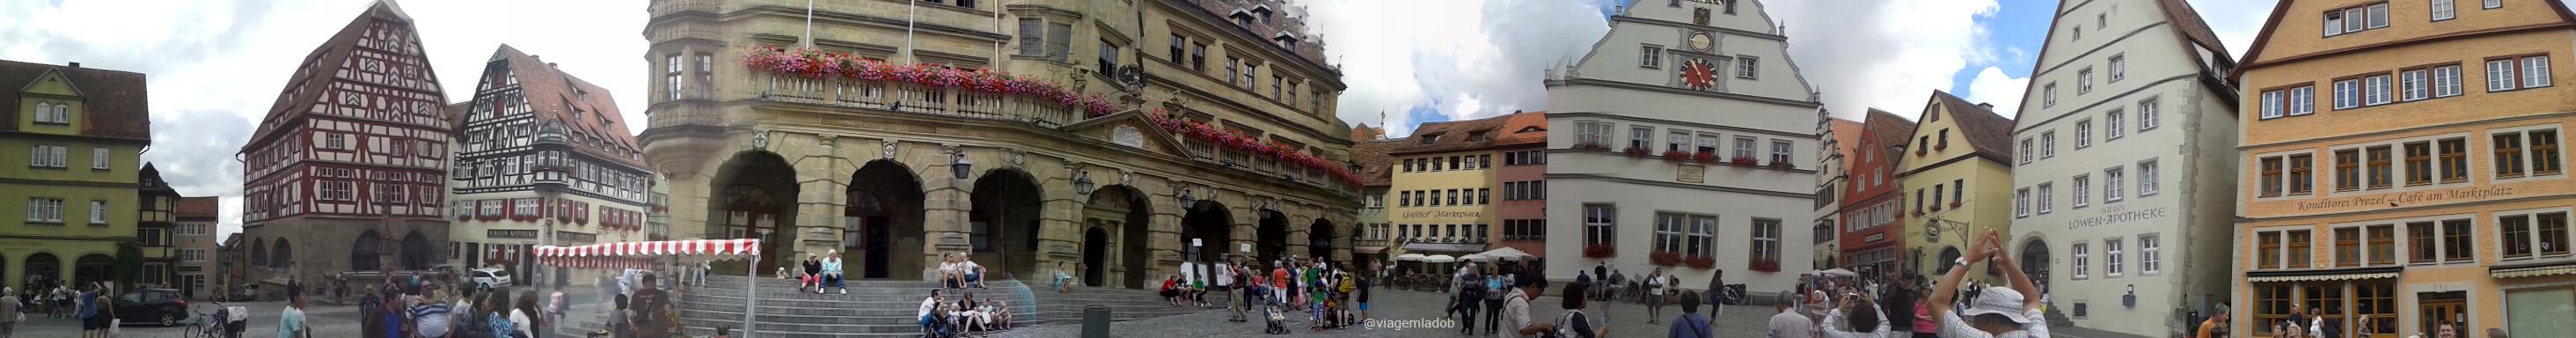 Rothenburg ob der Tauber - Panorâmica